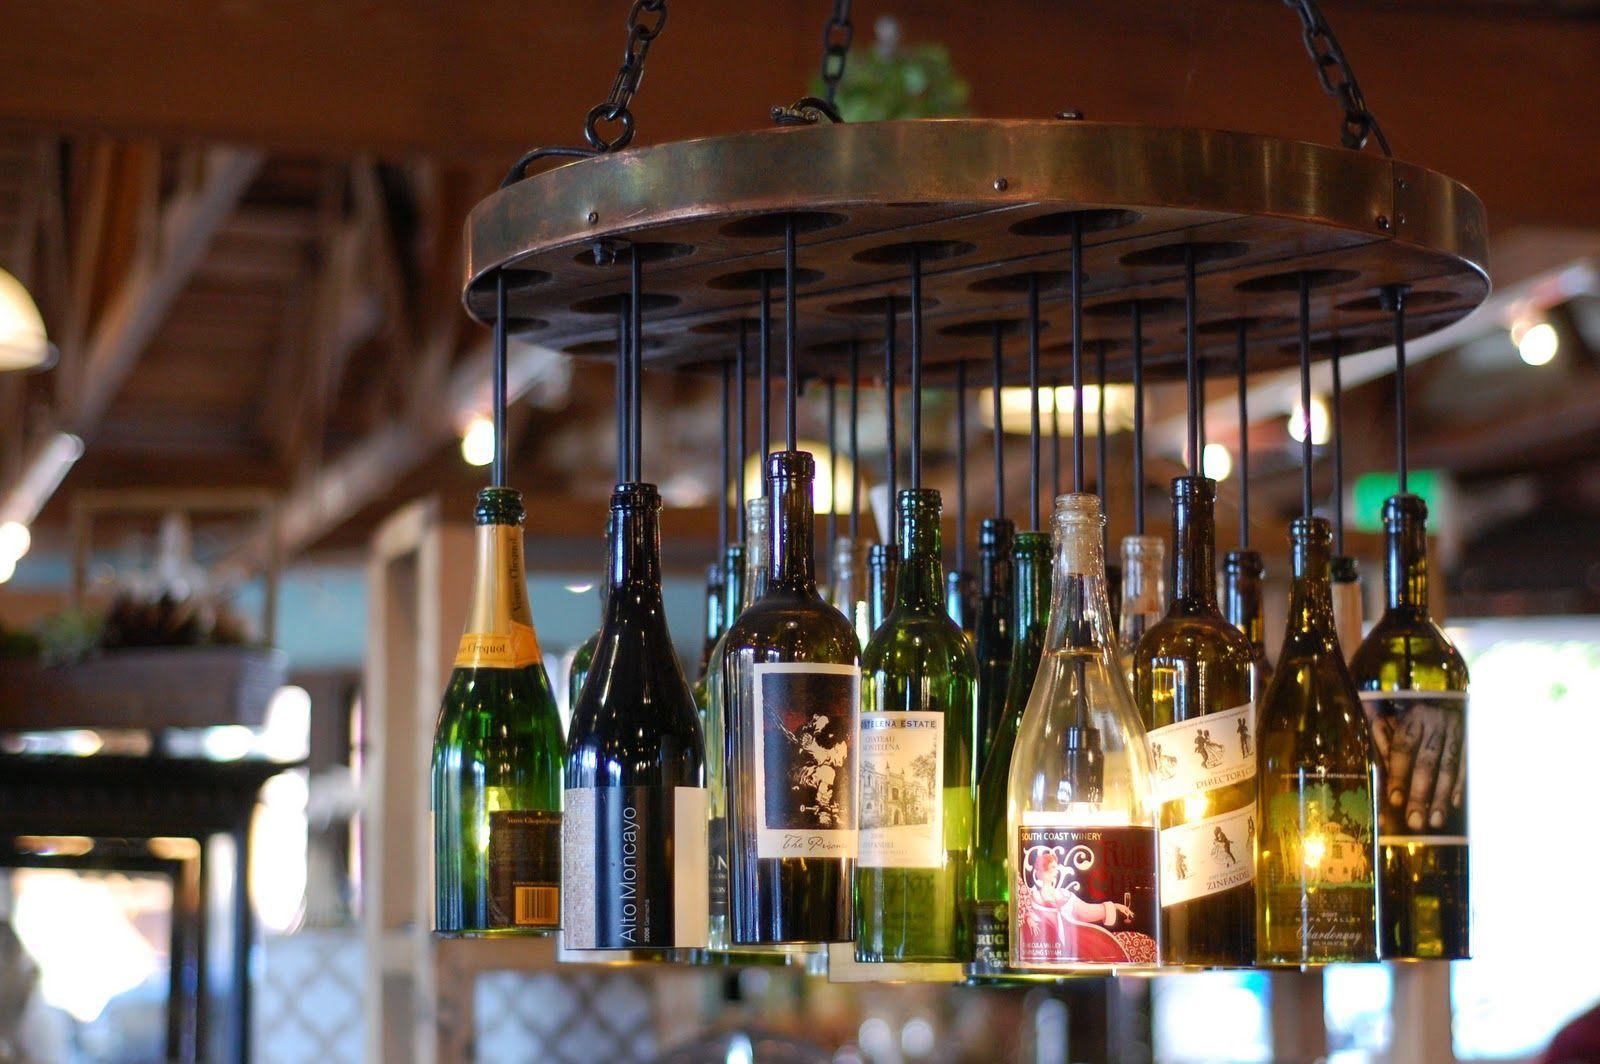 inexpensive lighting ideas. 19 Inexpensive \u0026 Creative DIY Wine Bottle Lighting Ideas